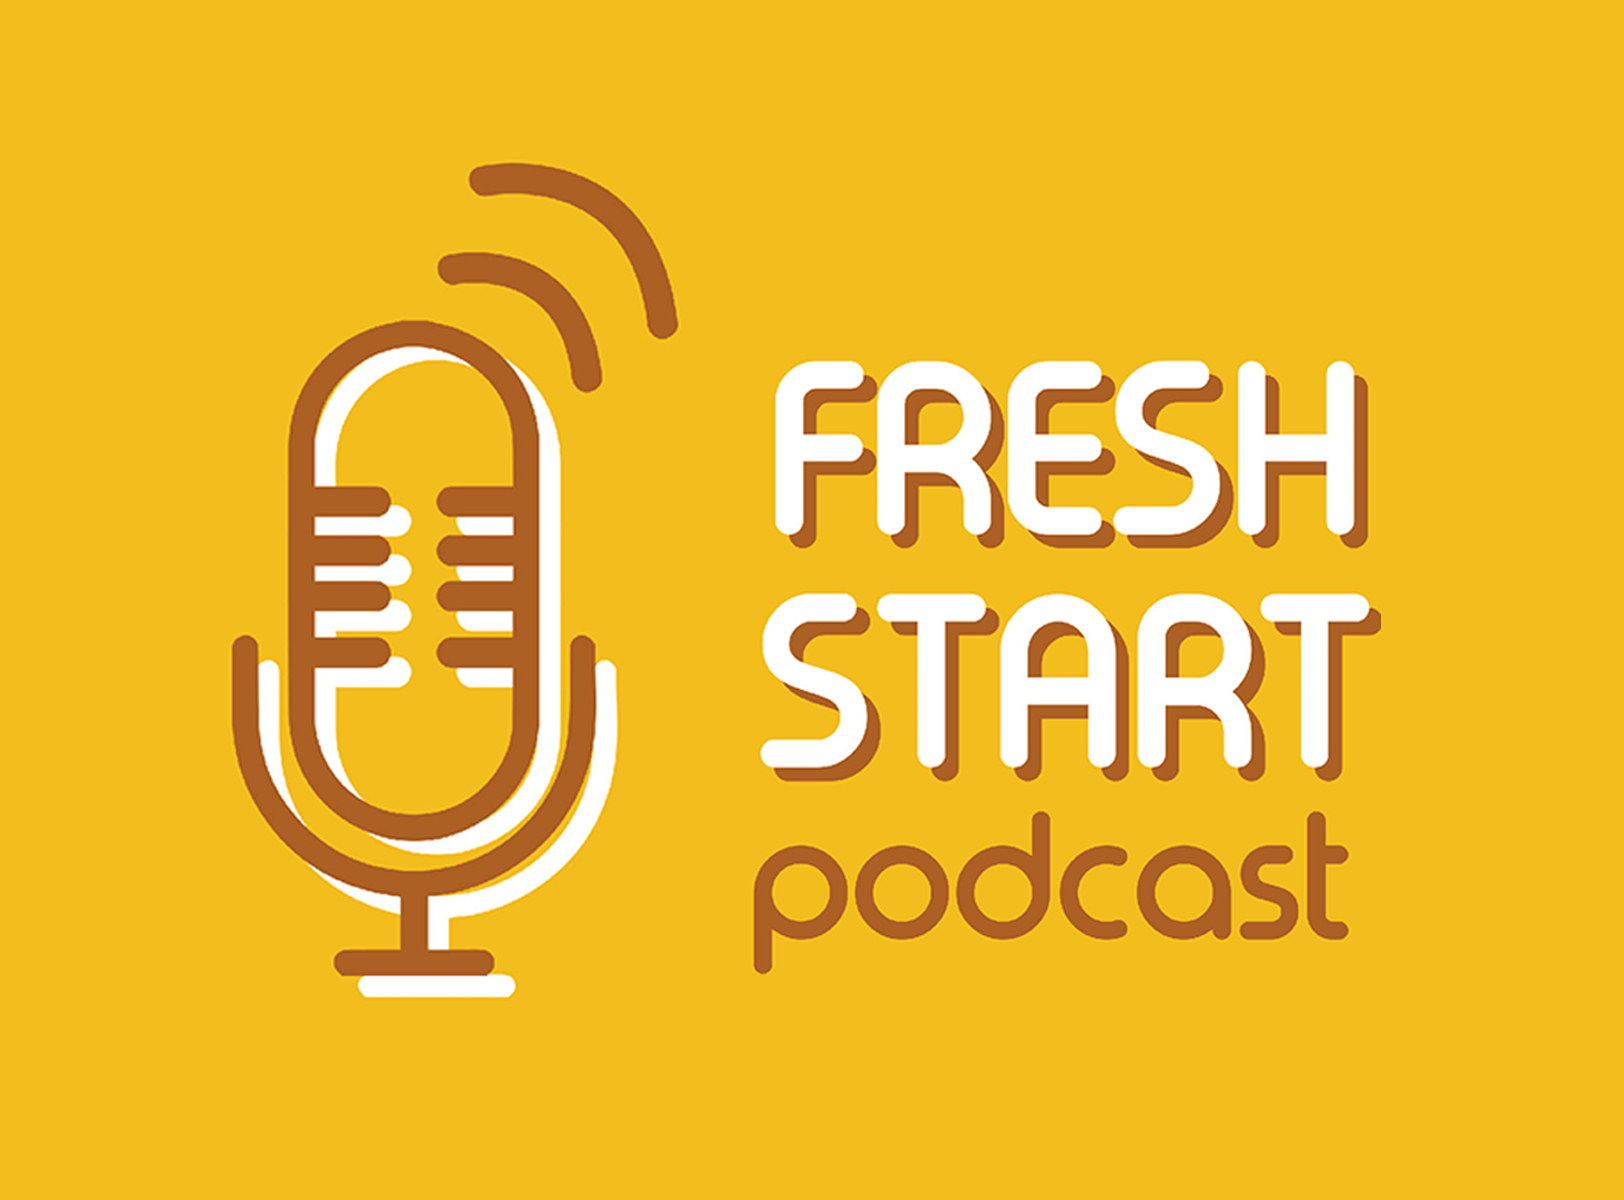 Fresh Start: Podcast News (12/24/2018 Mon.)